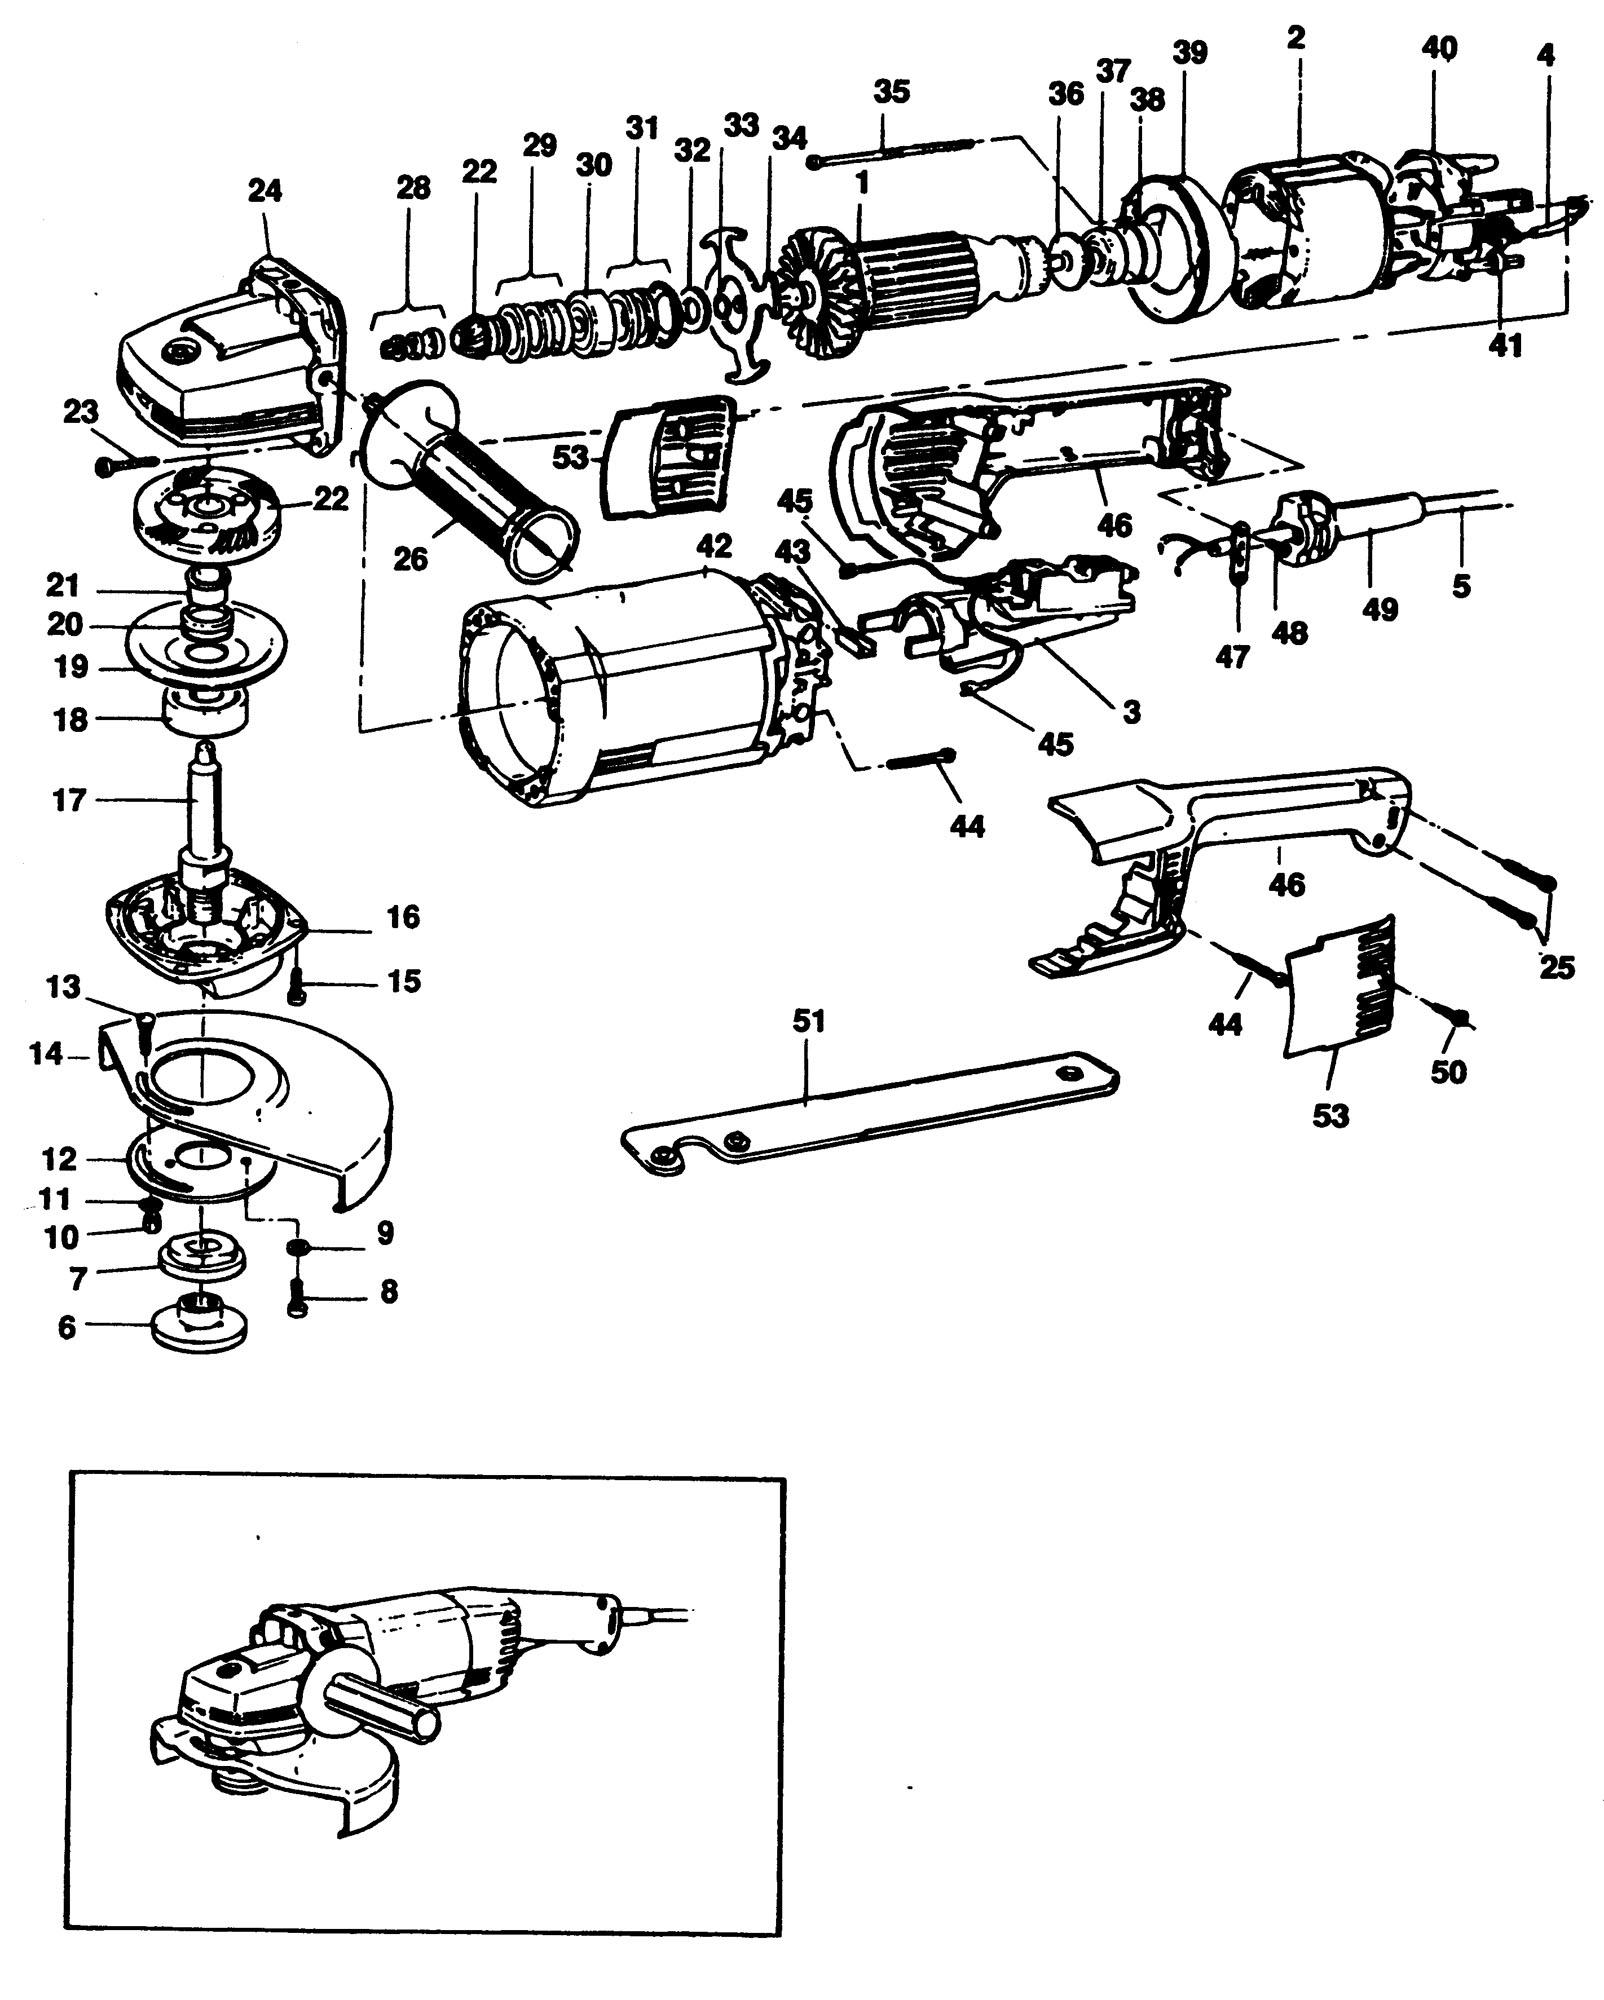 Spares for Black & Decker P5721 Angle Grinder (type 1